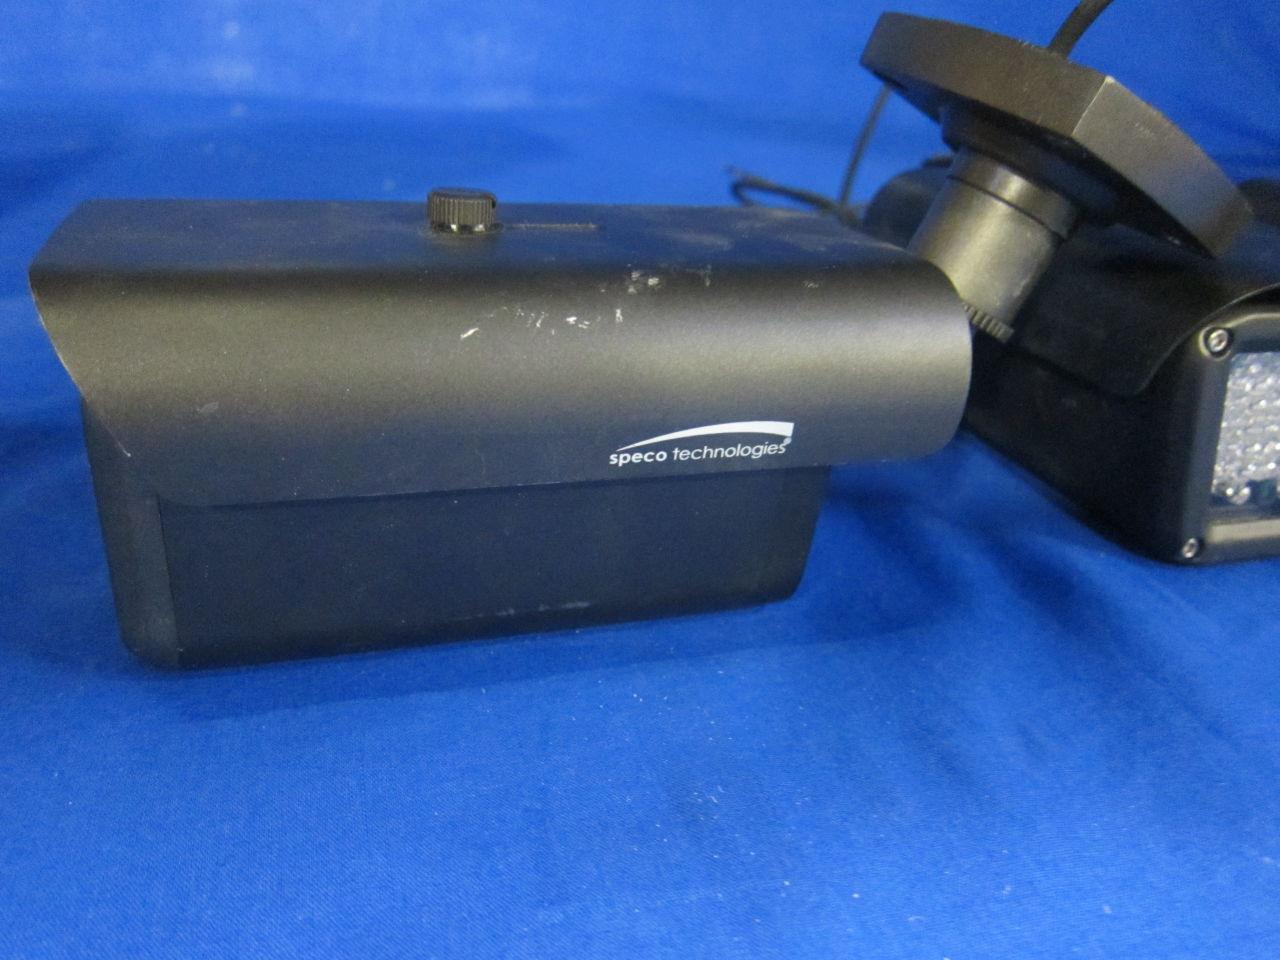 SPECO TECHNOLOGIES IR60 Infrared Camera